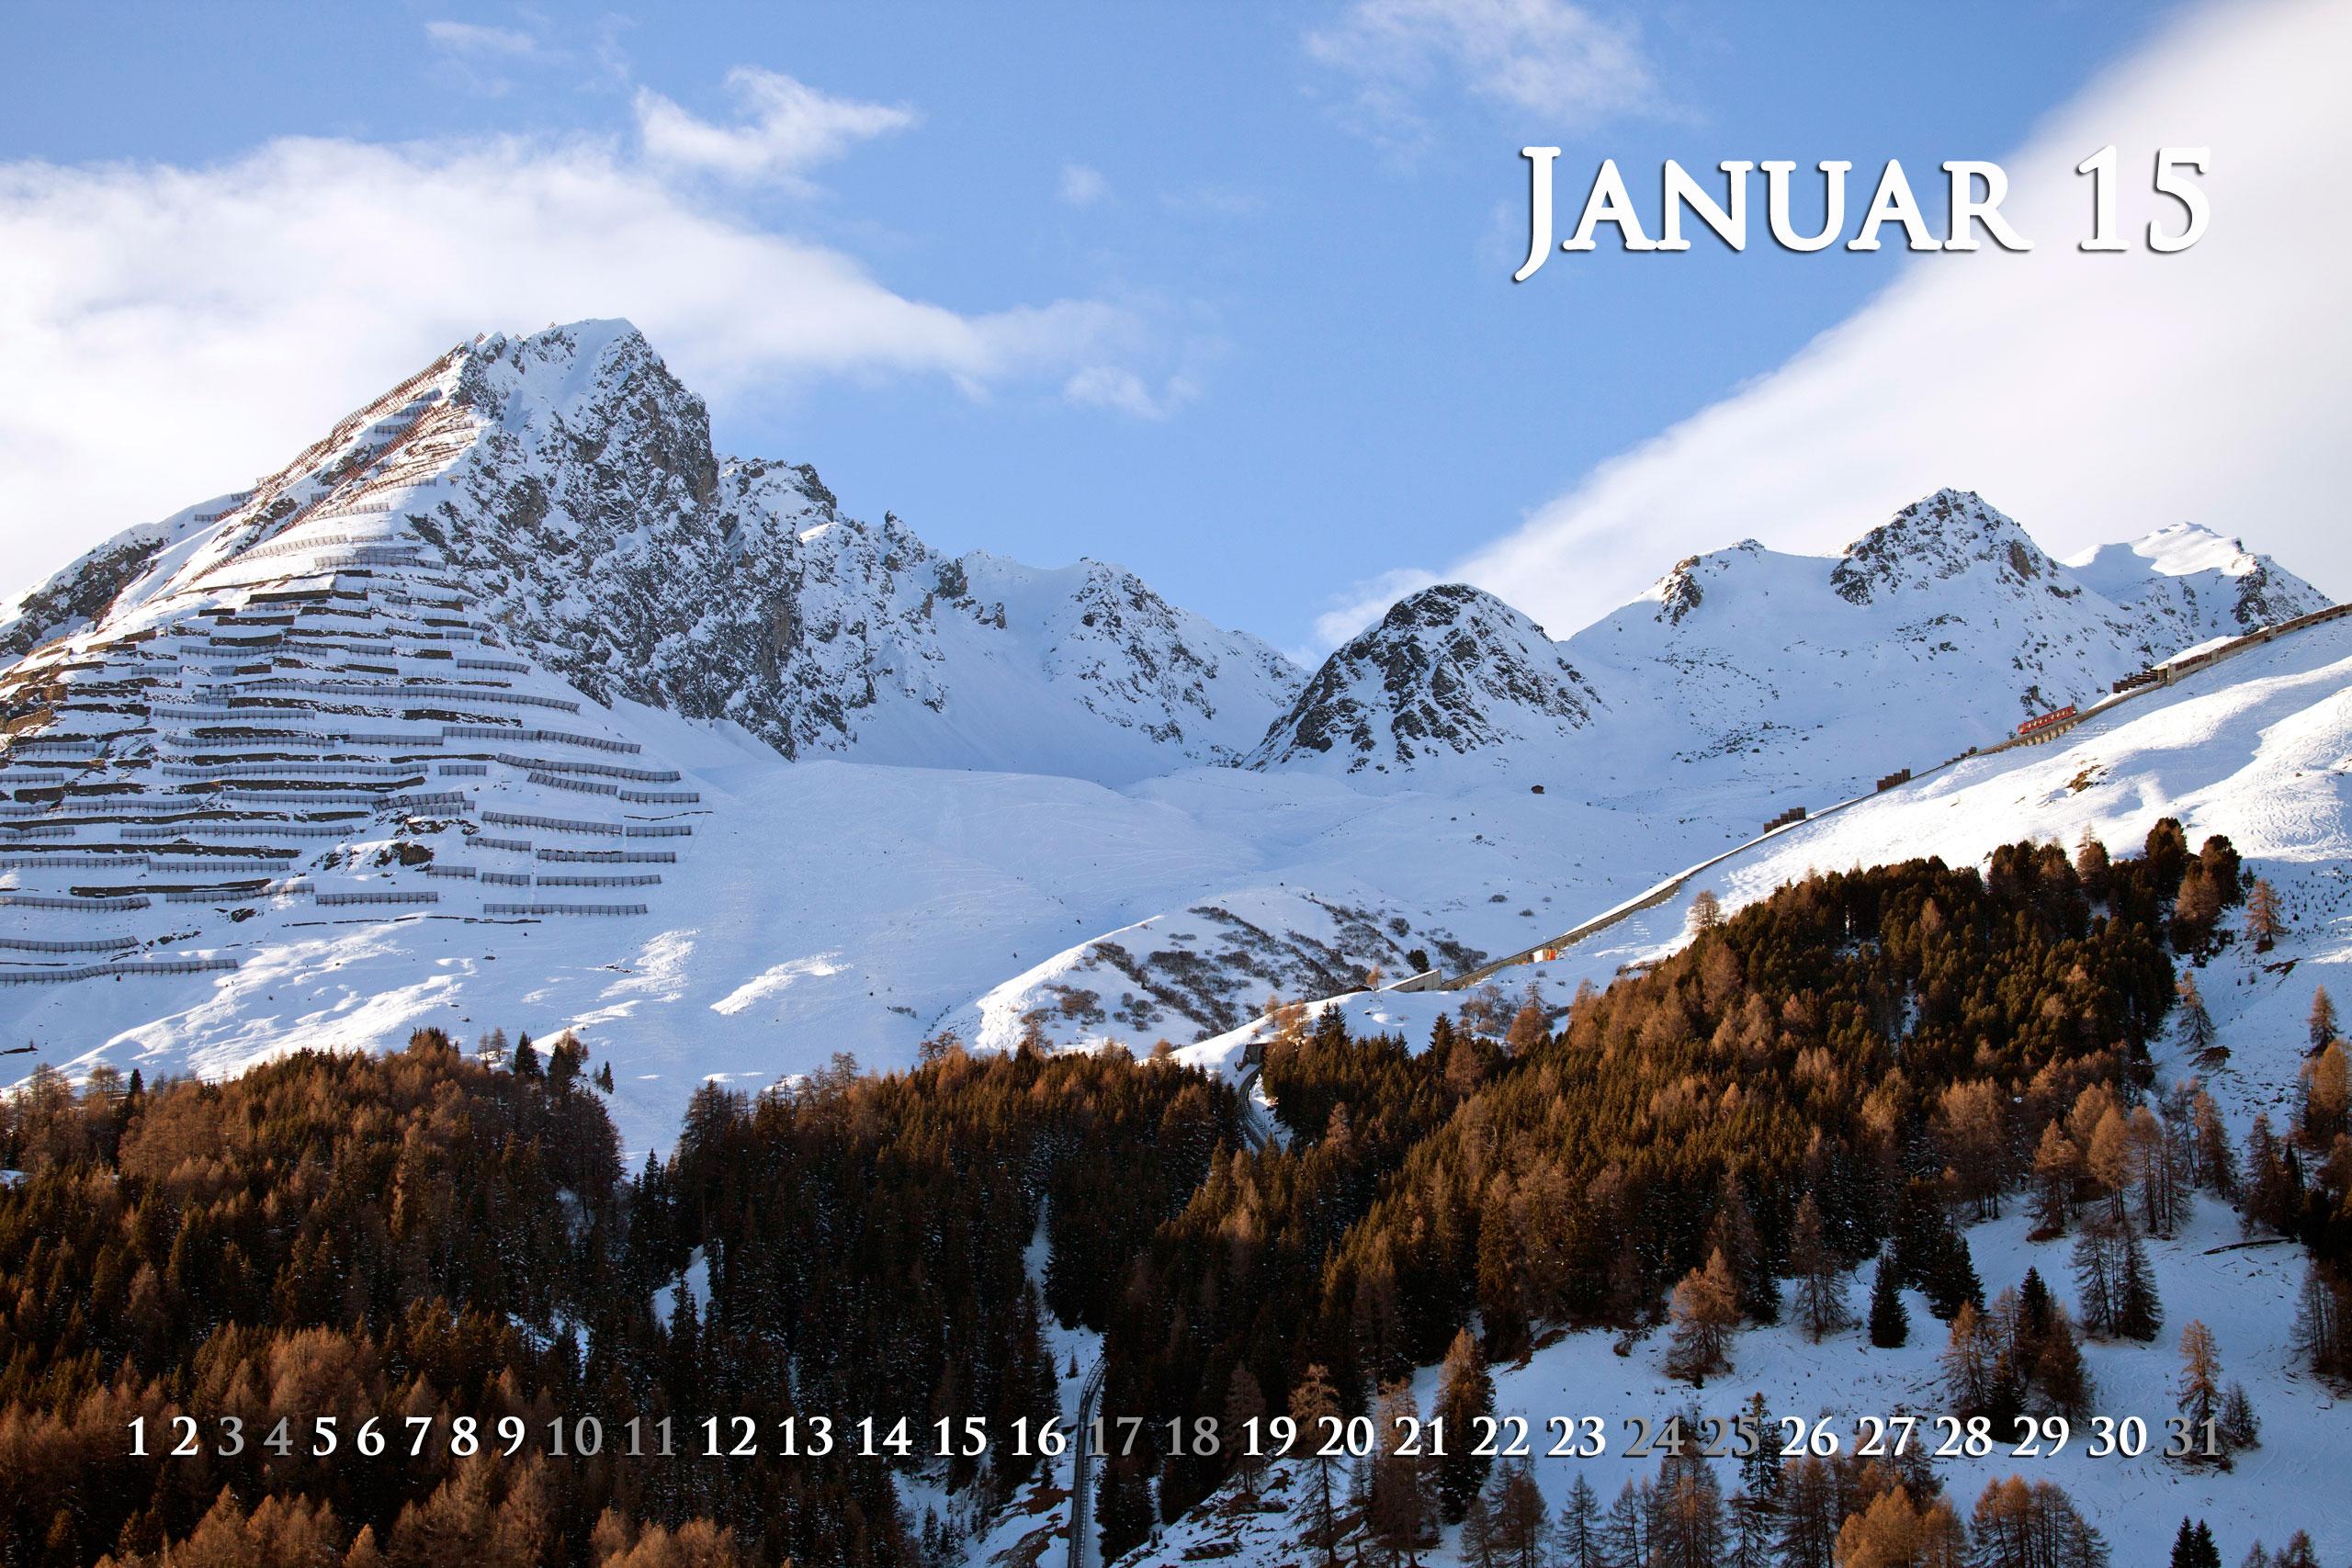 Januar 2015 Wallpaper | Search Results | Calendar 2015